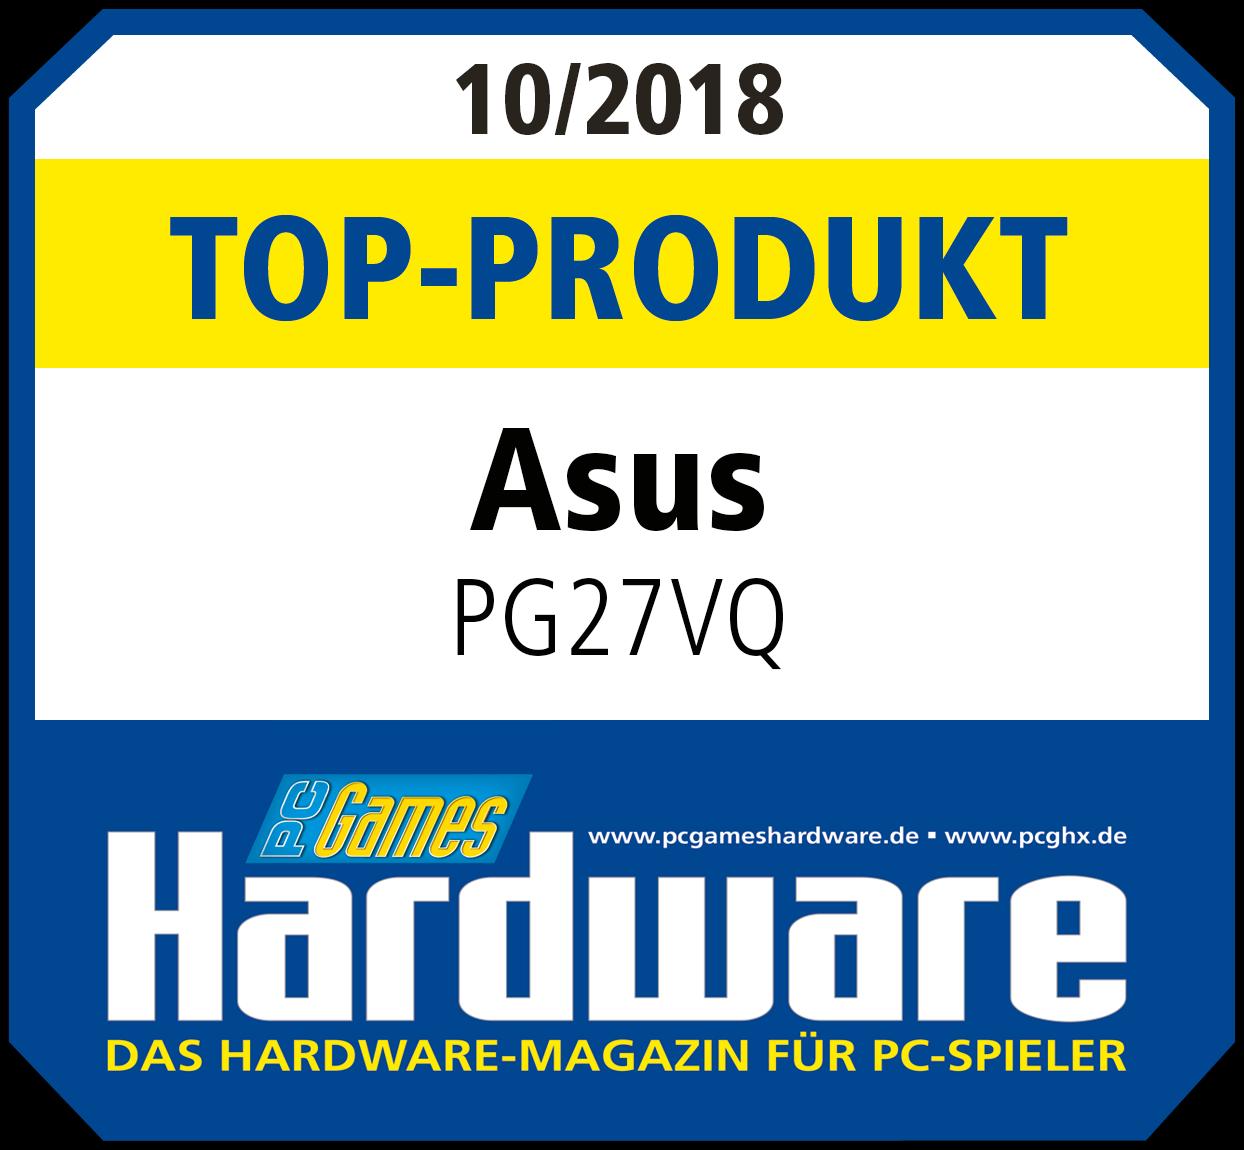 Top-Produkt